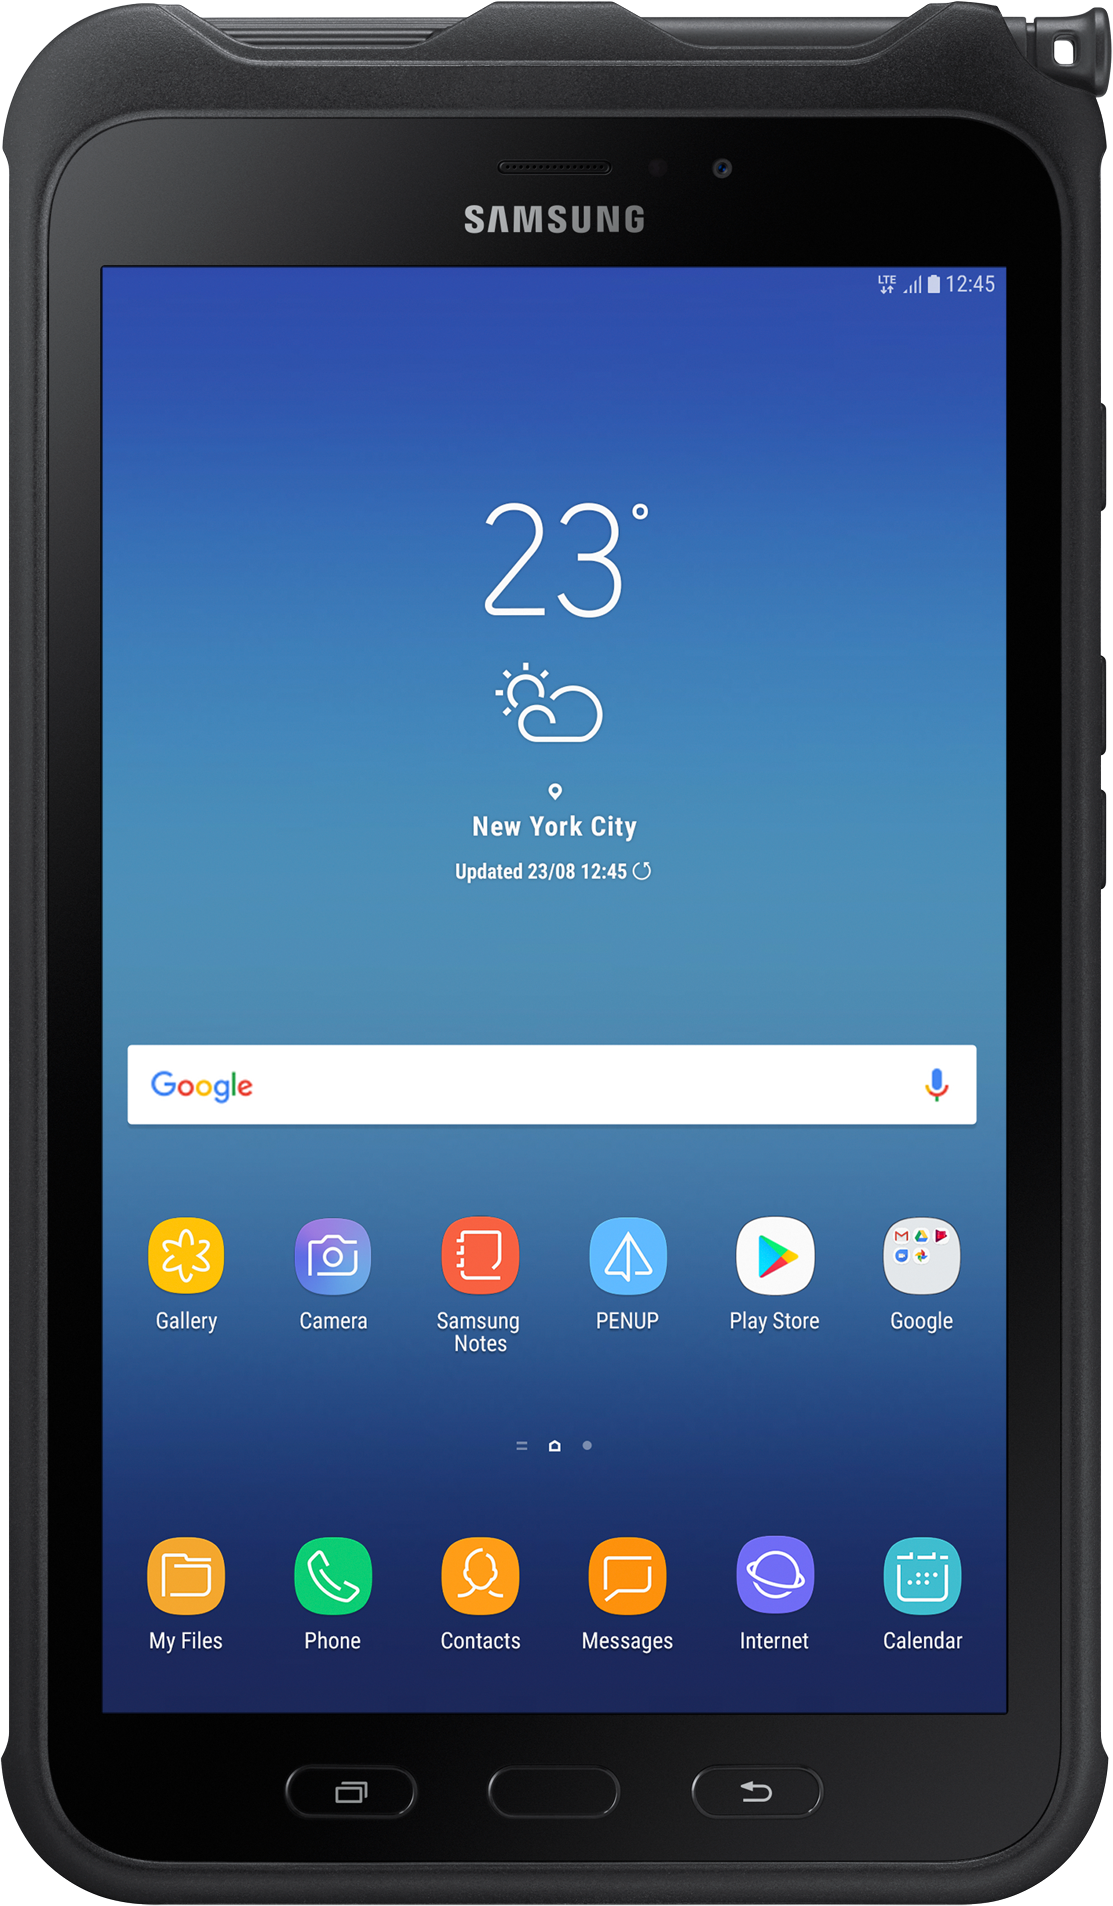 Samsung Galaxy Tab Active 2 8 tablet (4G LTE) Tabletit ja